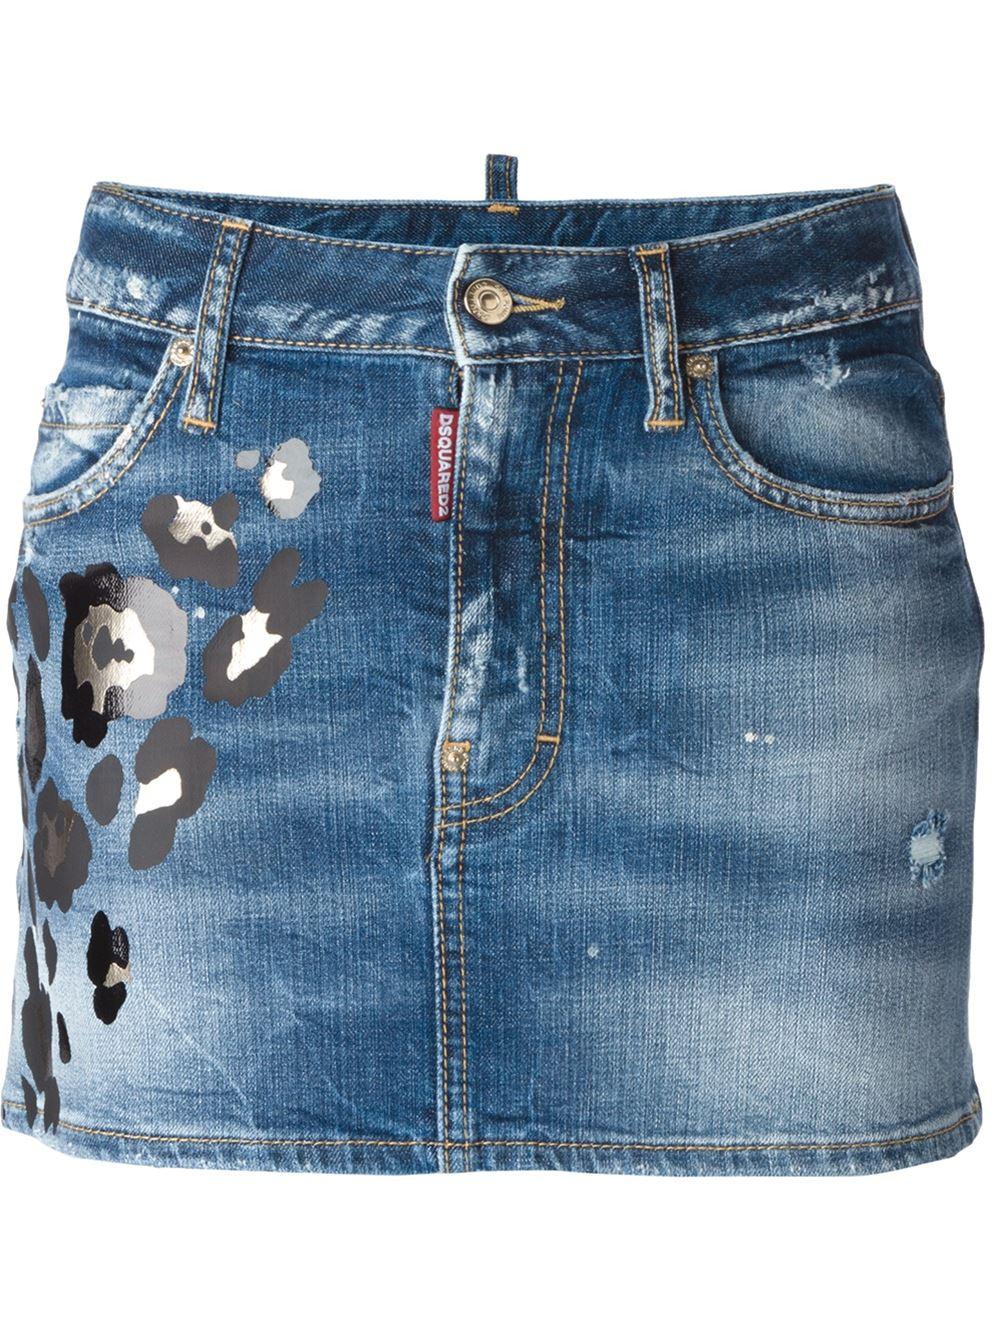 dsquared 178 leopard print denim skirt in blue lyst